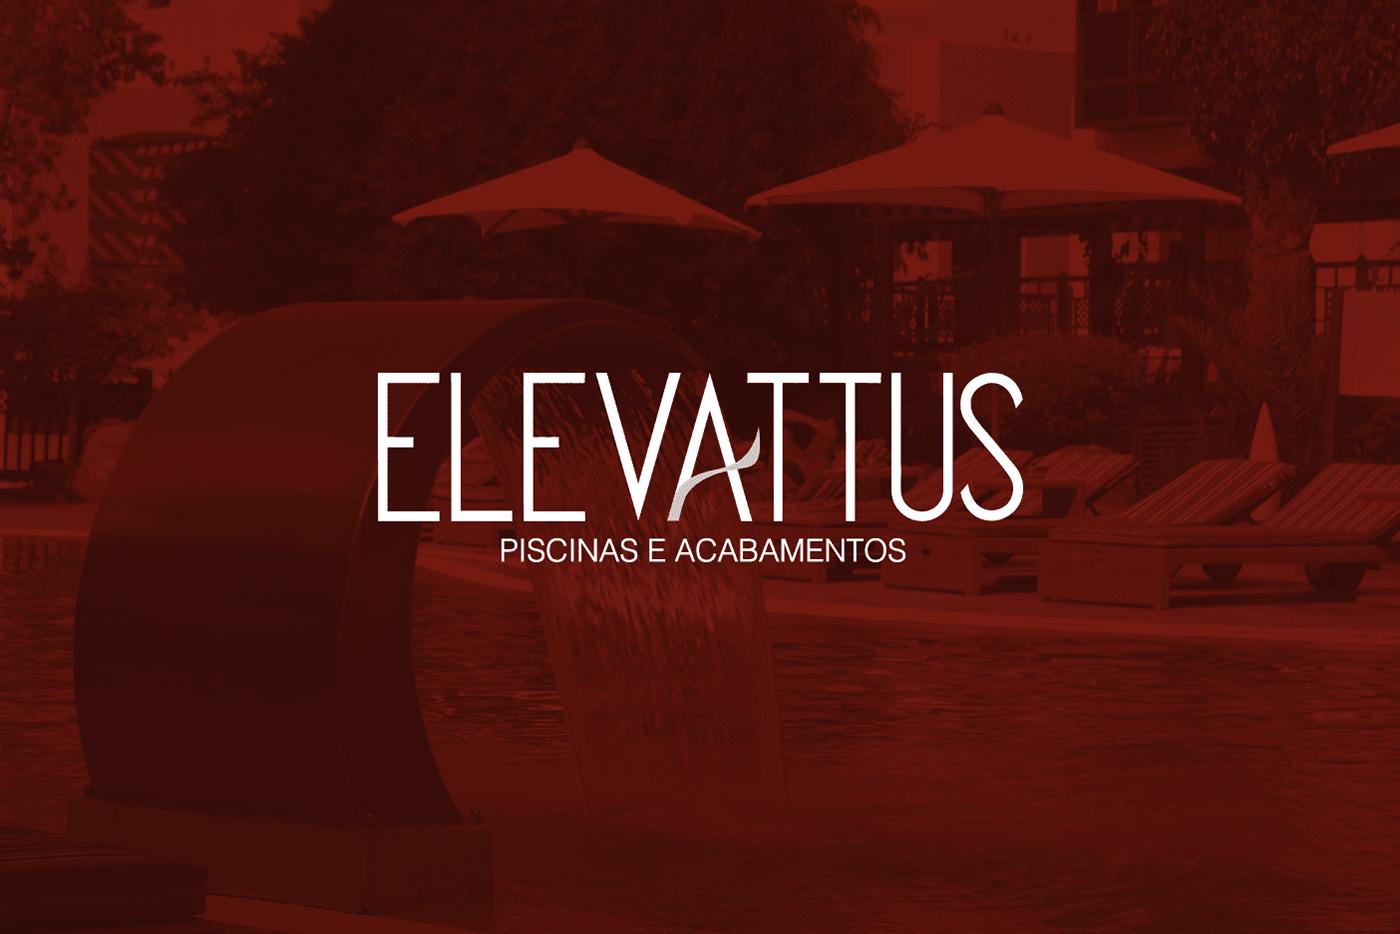 marca site piscina Acabamento branding  naming design Web Design  elevattus aleto